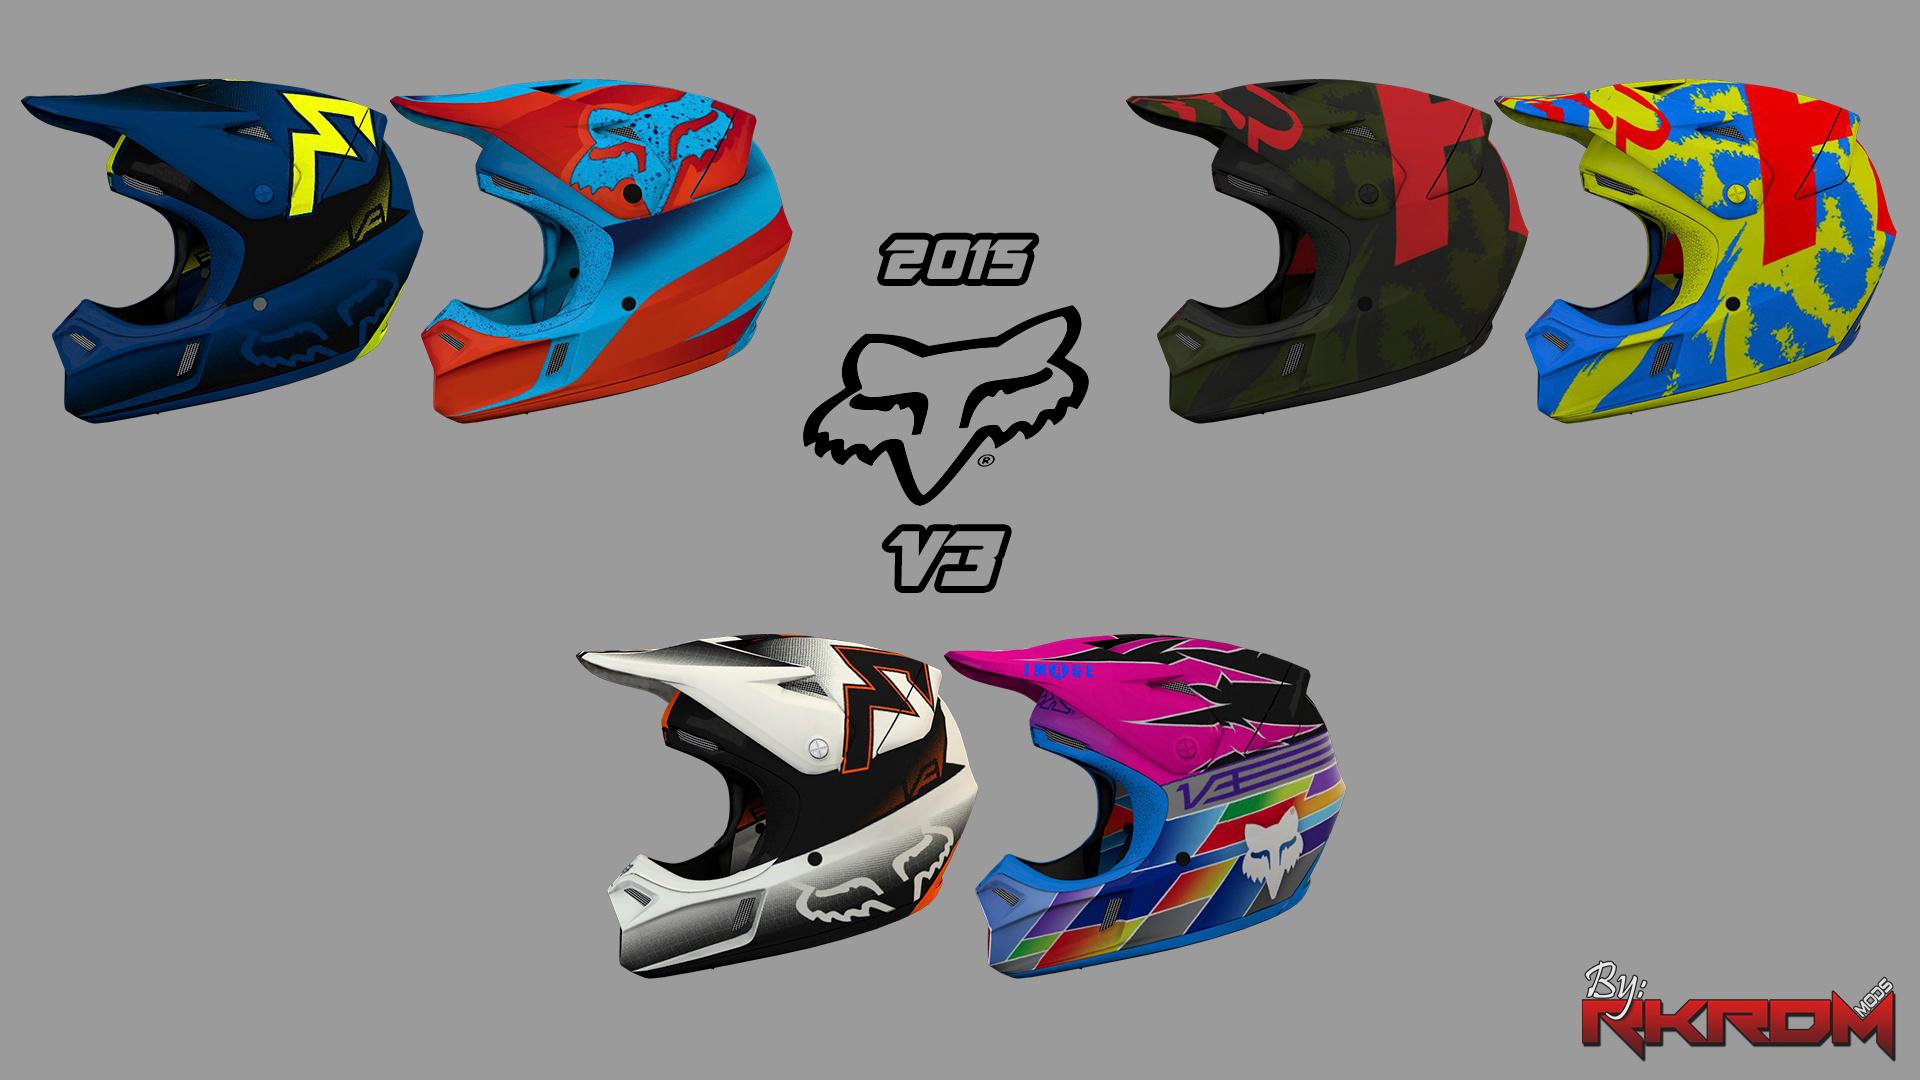 fd2c11c0 2015 FOX V3 Helmets + Shift Faction Goggles - GTA5-Mods.com